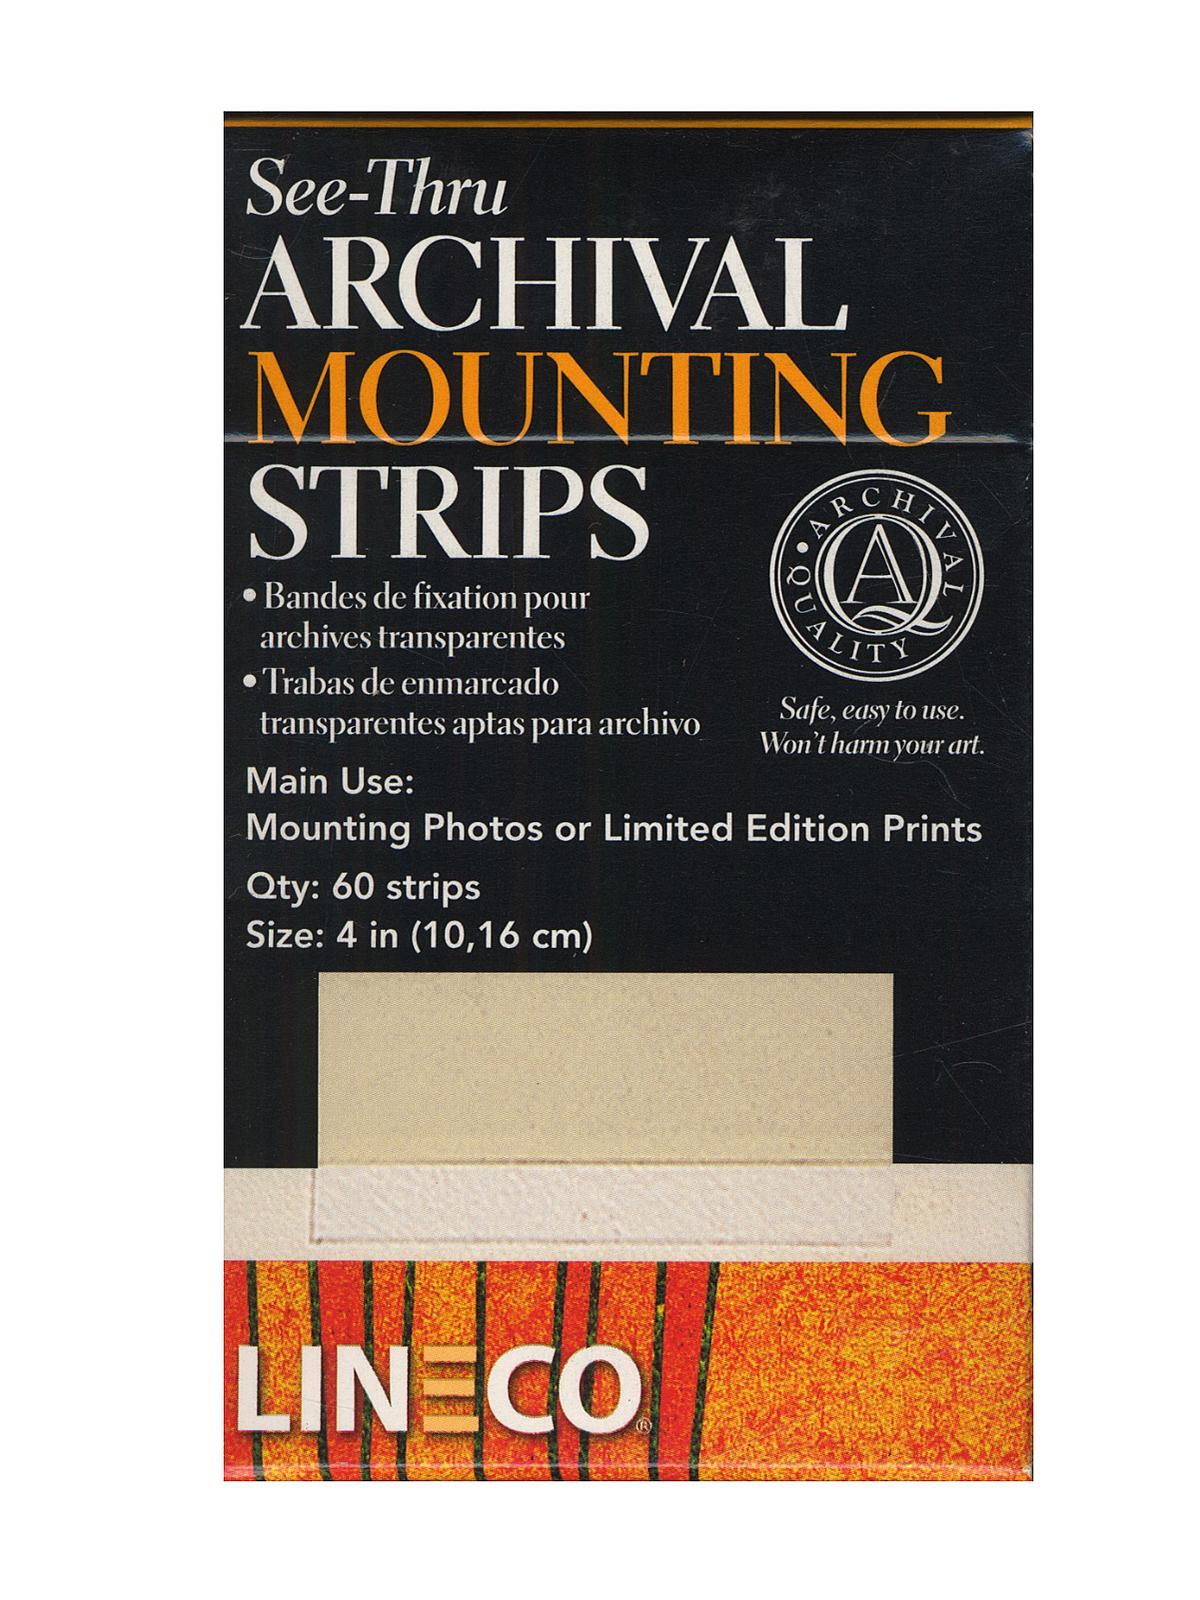 Self-Stick Mounting Strips